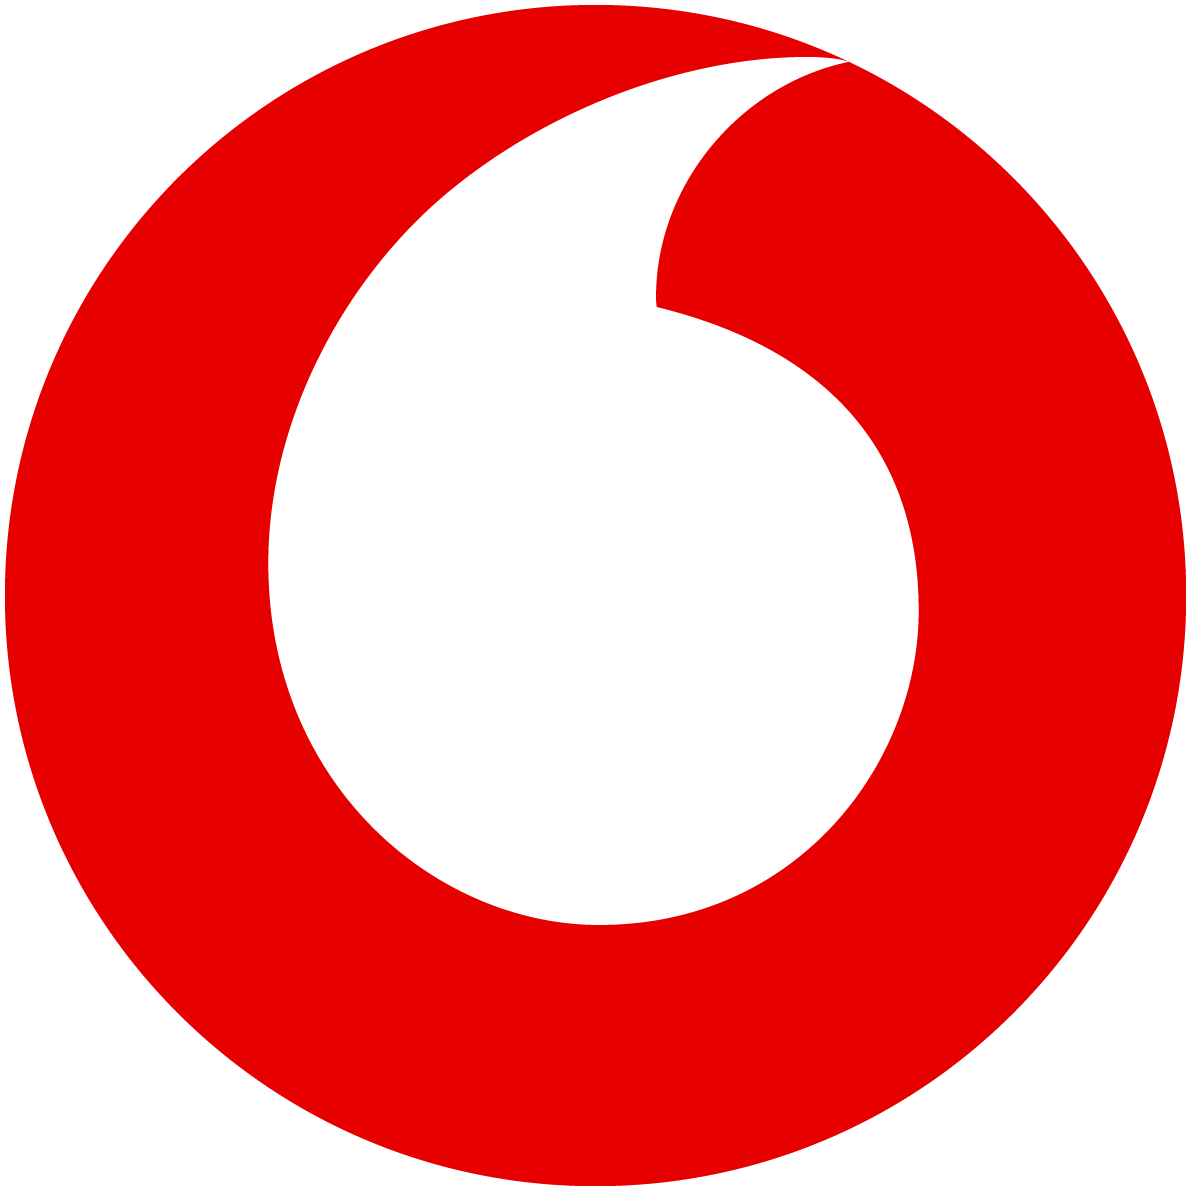 Vodafone GK 4.0 Connector Integration